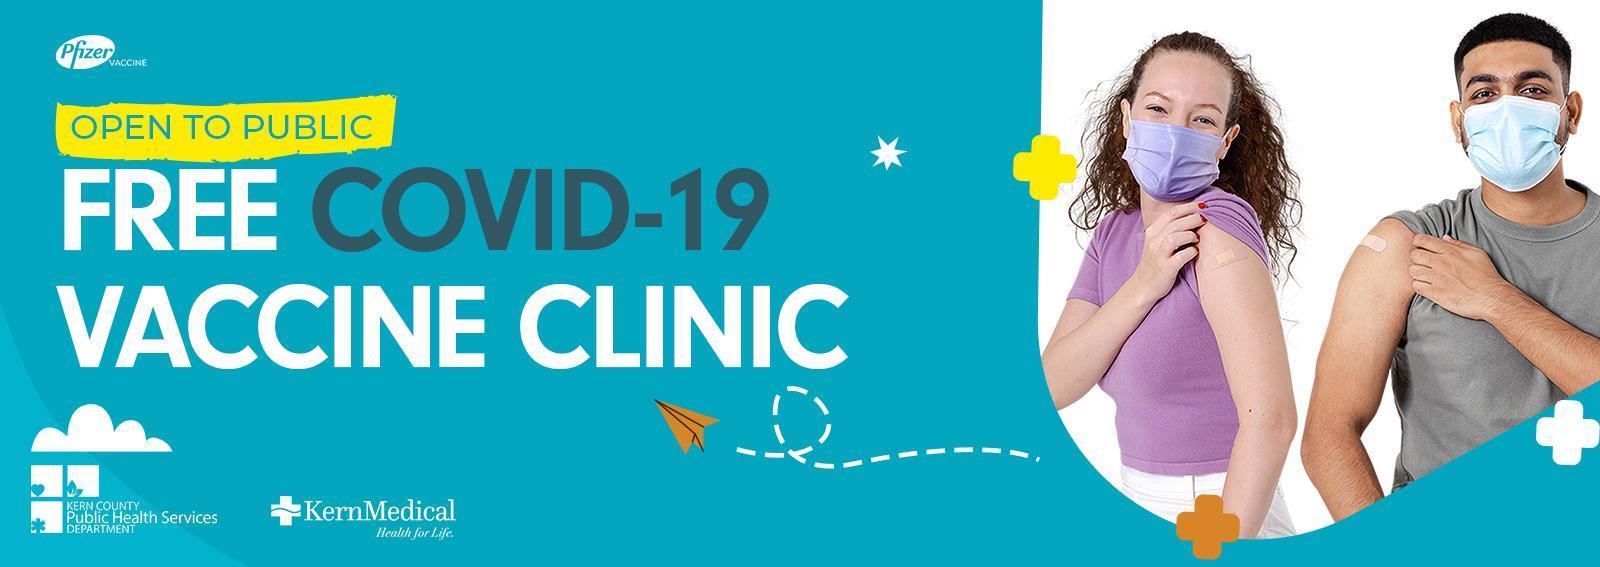 Free COVID-19 Vaccination Clinics